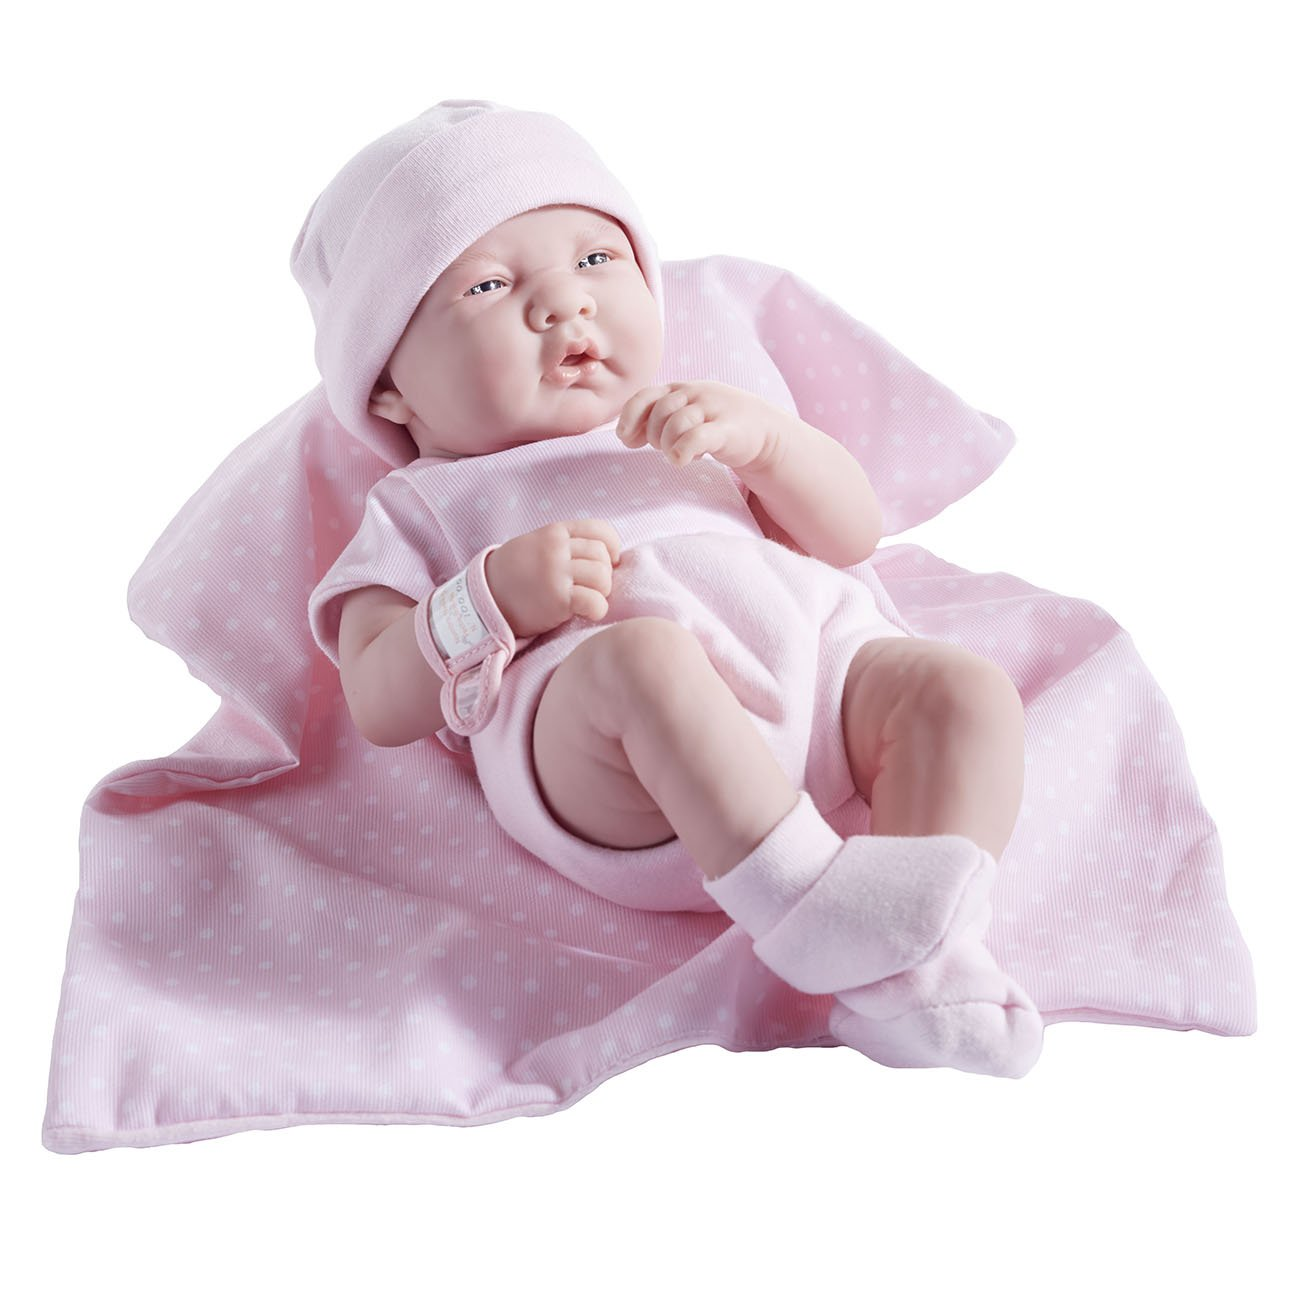 Blue JC Toys Berenguer Boutique La Newborn 14-Inch Life-Like Real Boy Doll 9 Piece Gift Set